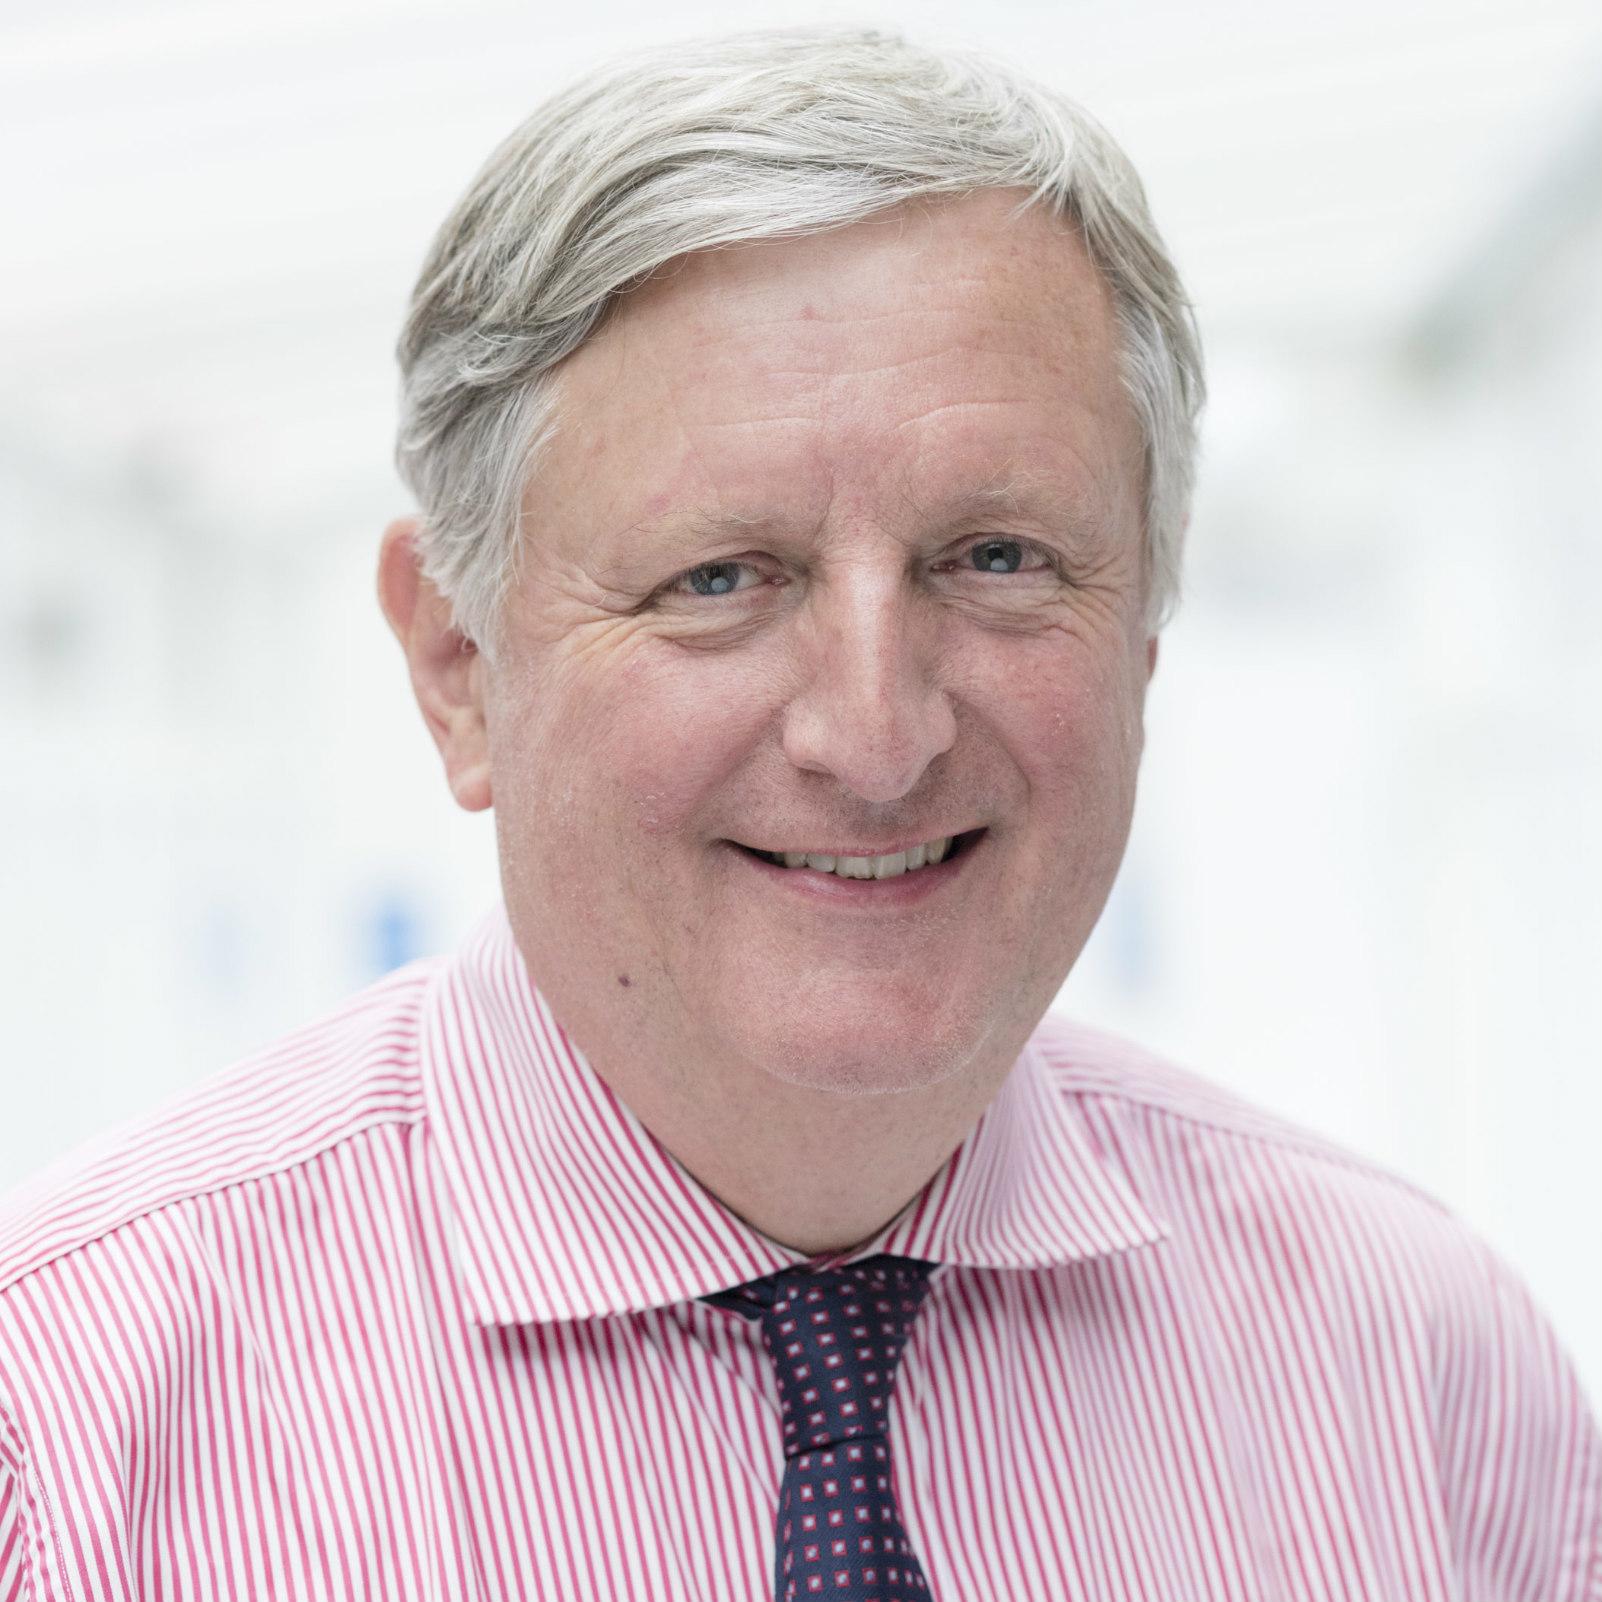 Professor John Pepper Royal Brompton Harefield Specialist Care